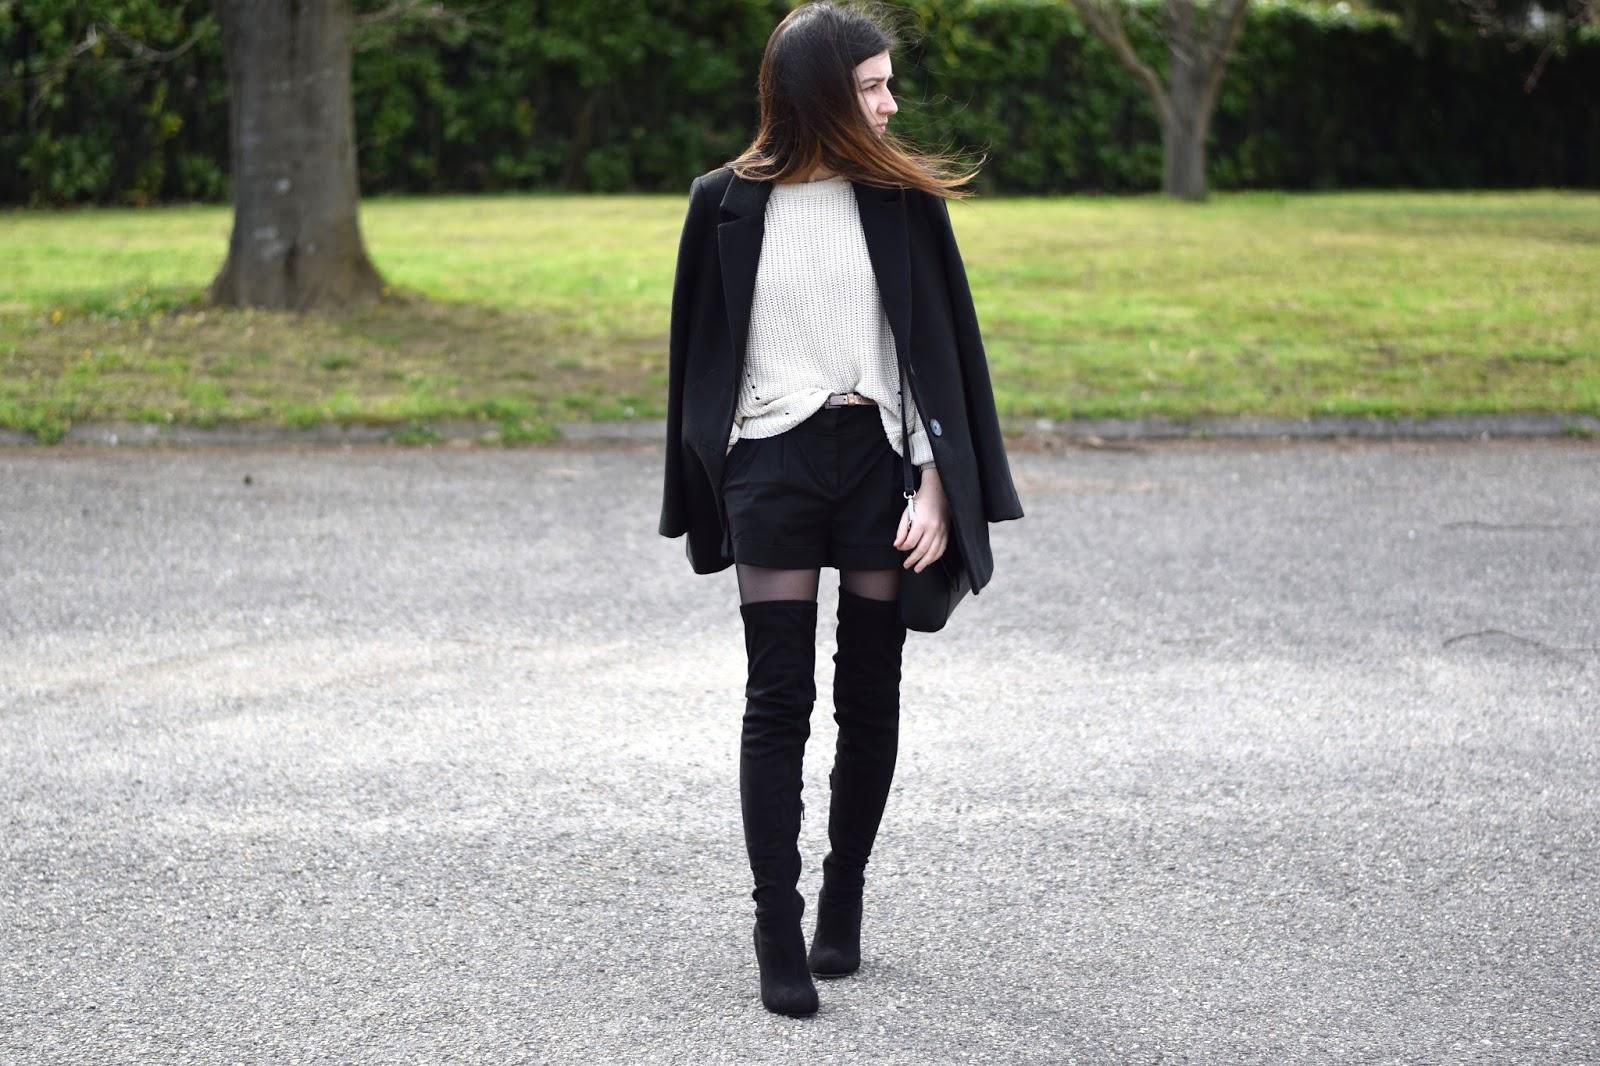 fashion h&m mode manteau noir